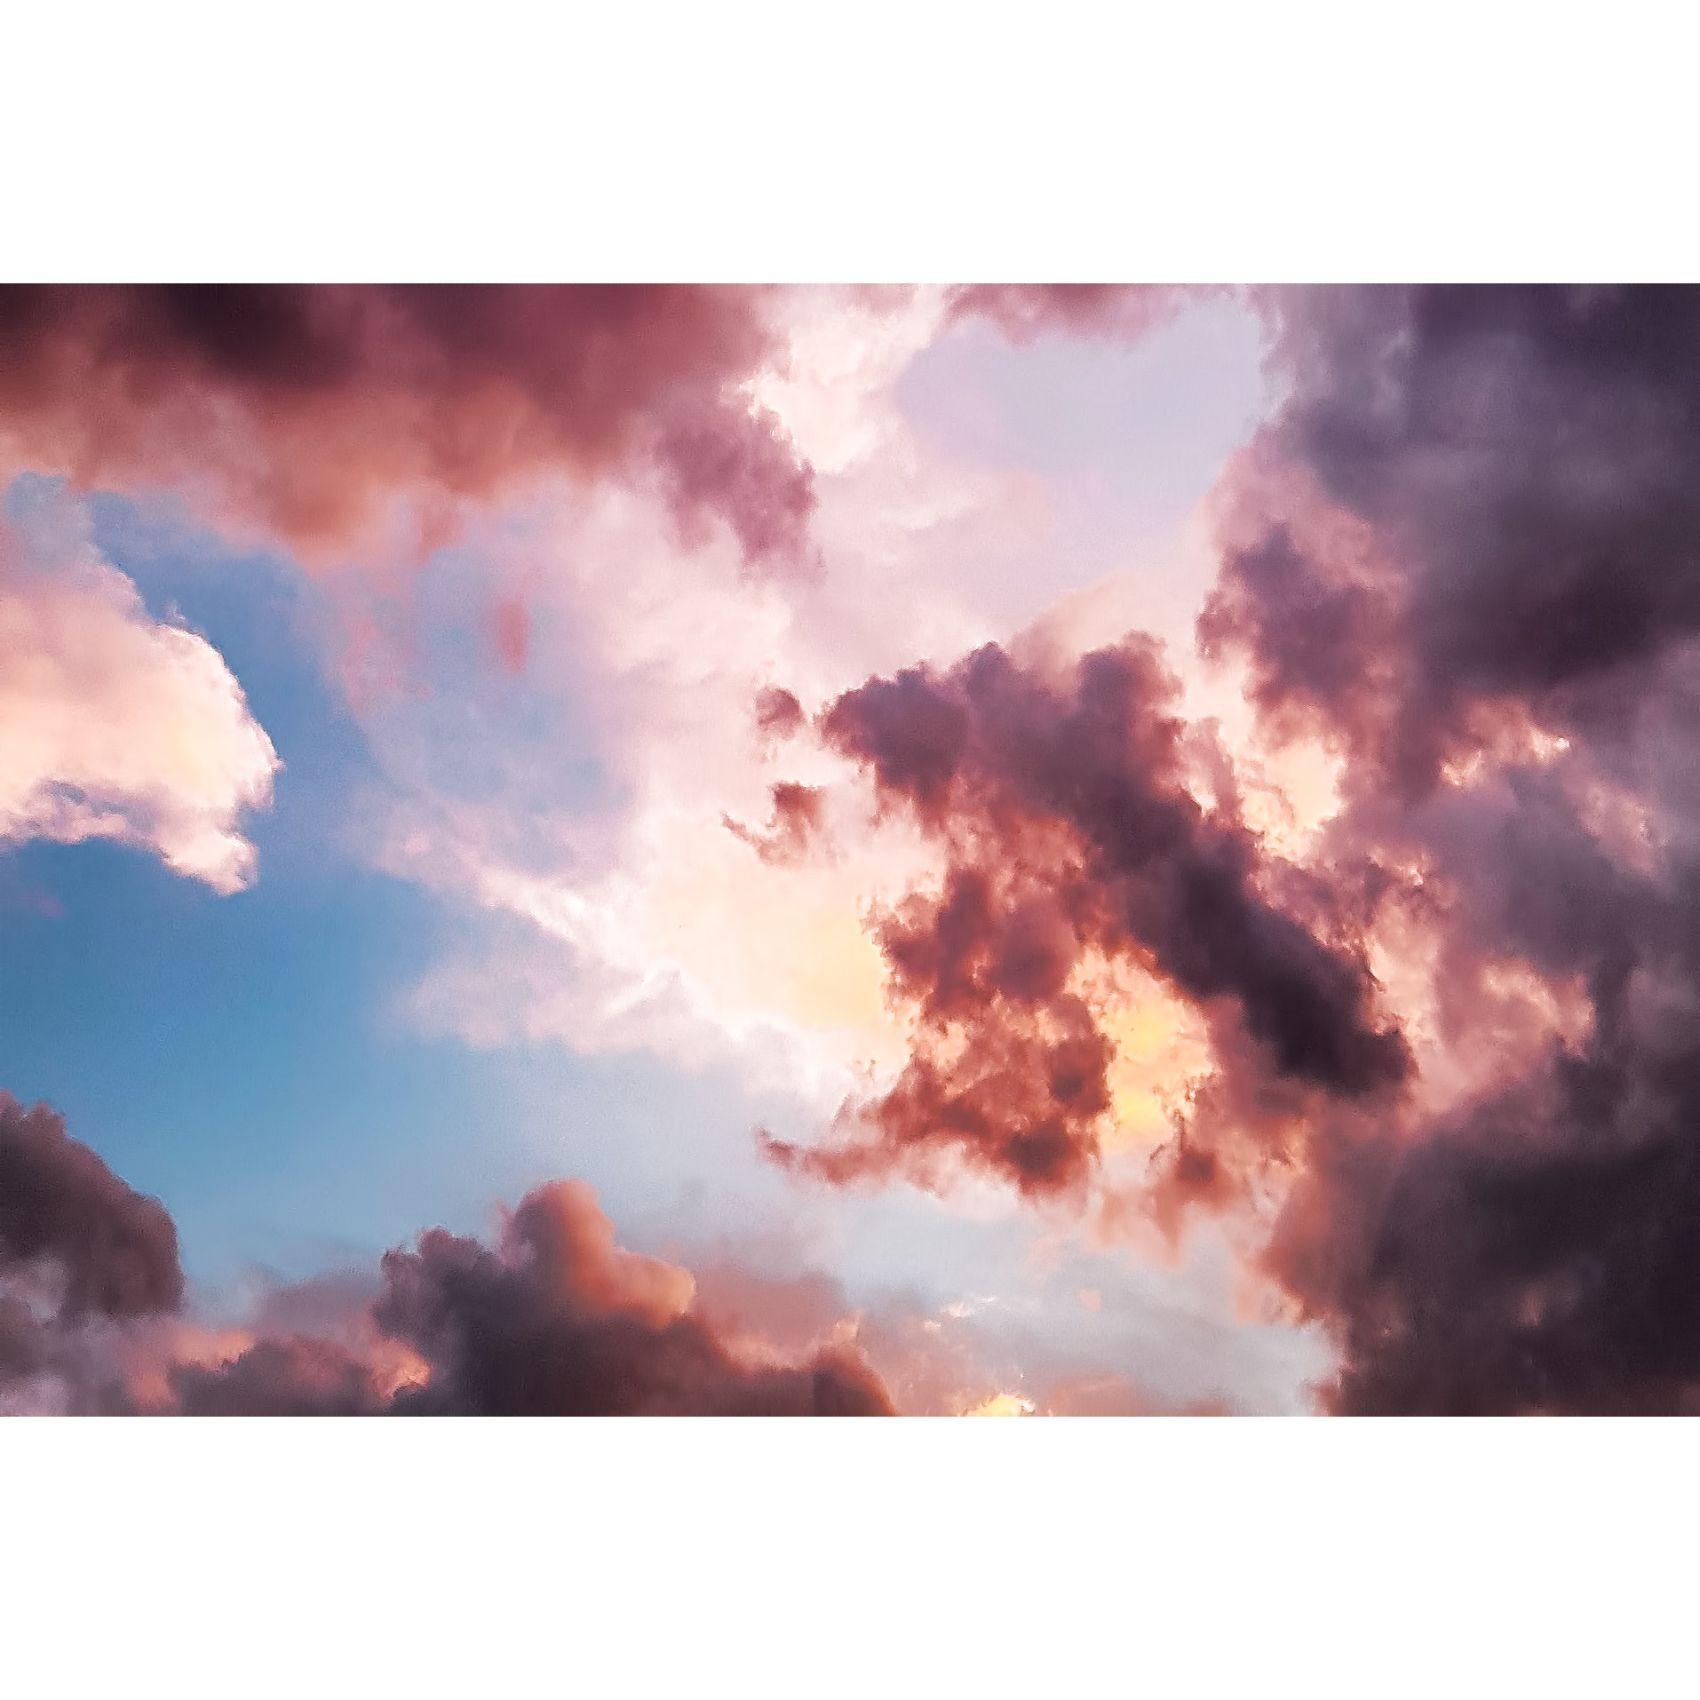 Discovering MErcy_Trauma Abuse Statistics_Pink sky